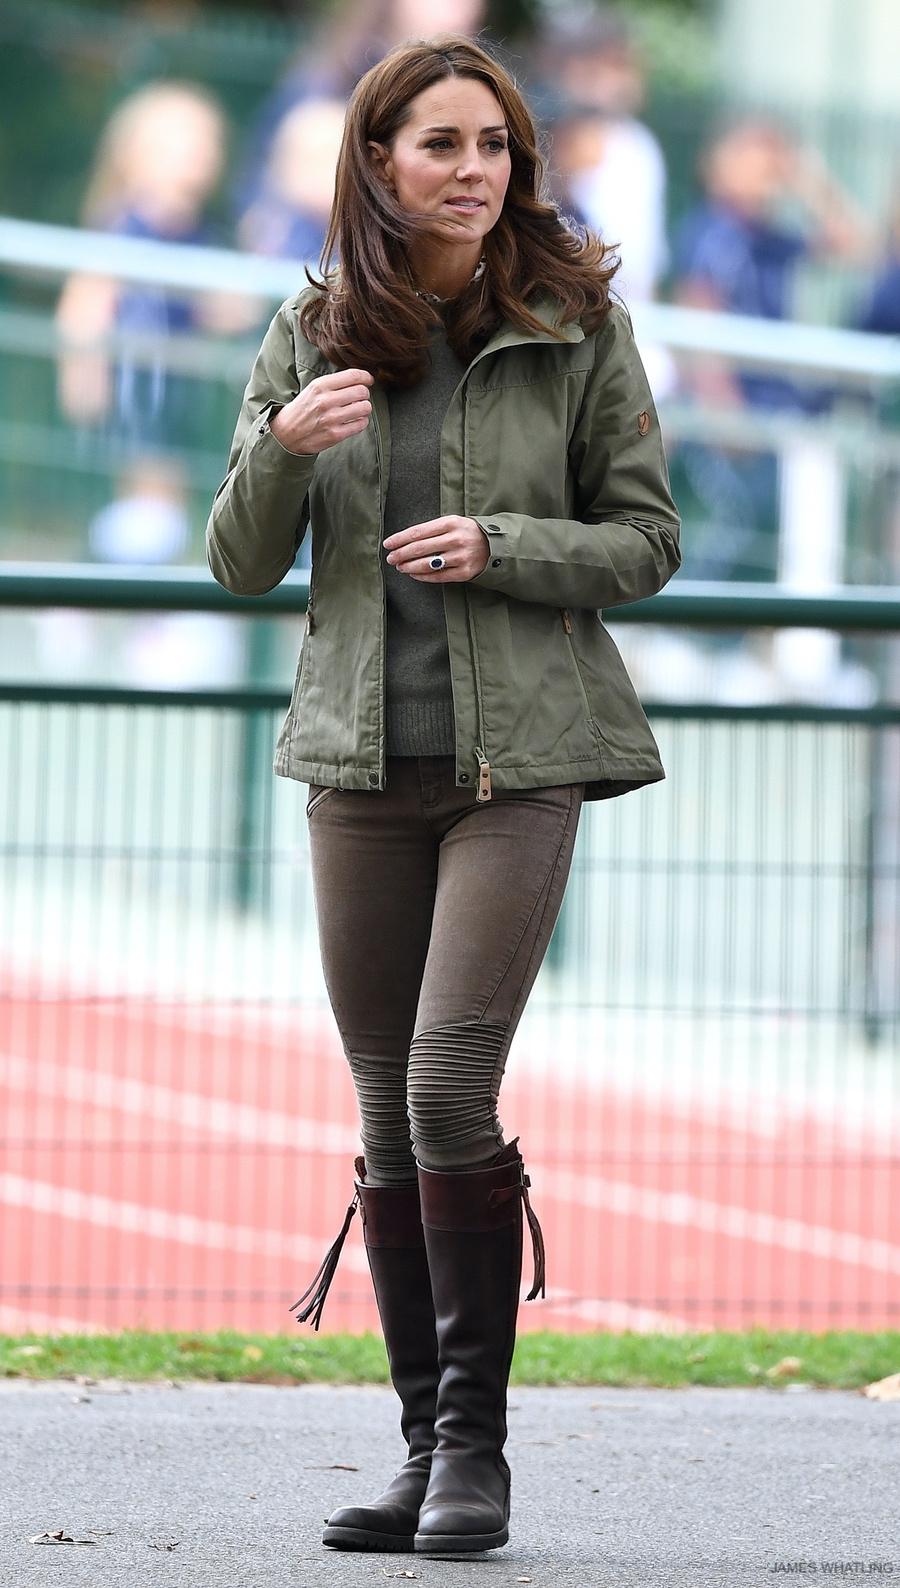 Kate Middleton visits Sayers Croft Forest School